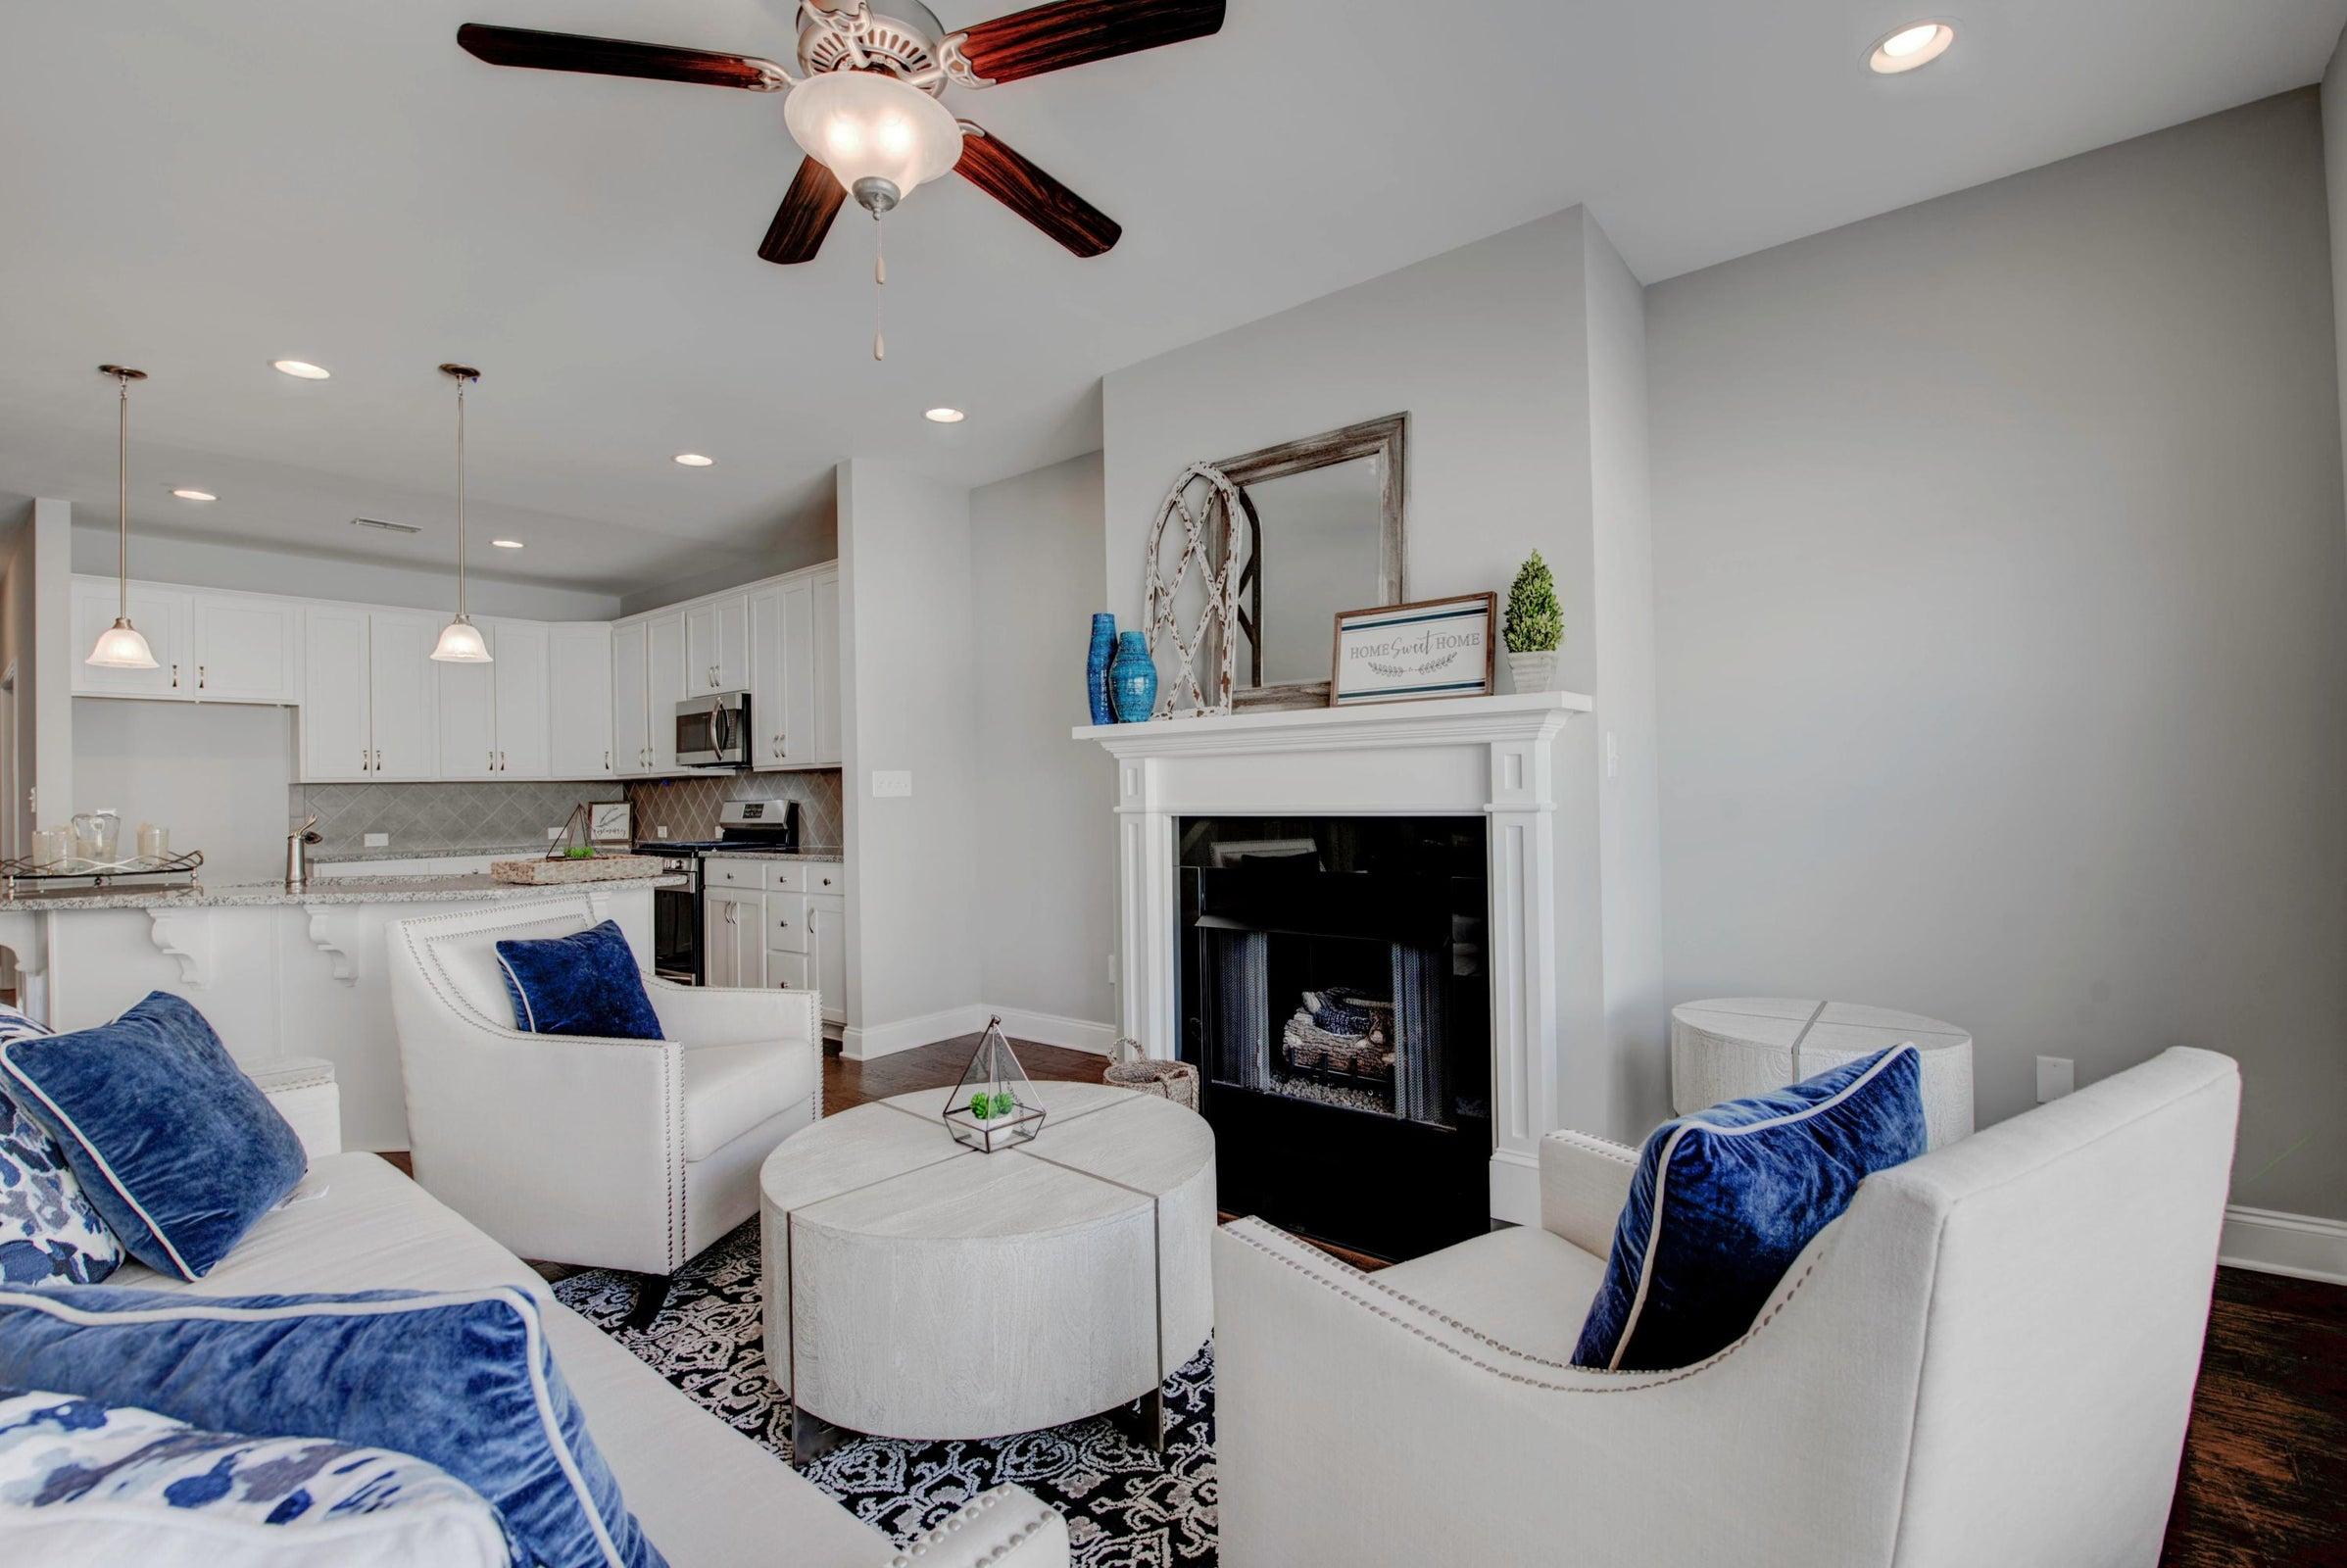 134 living room